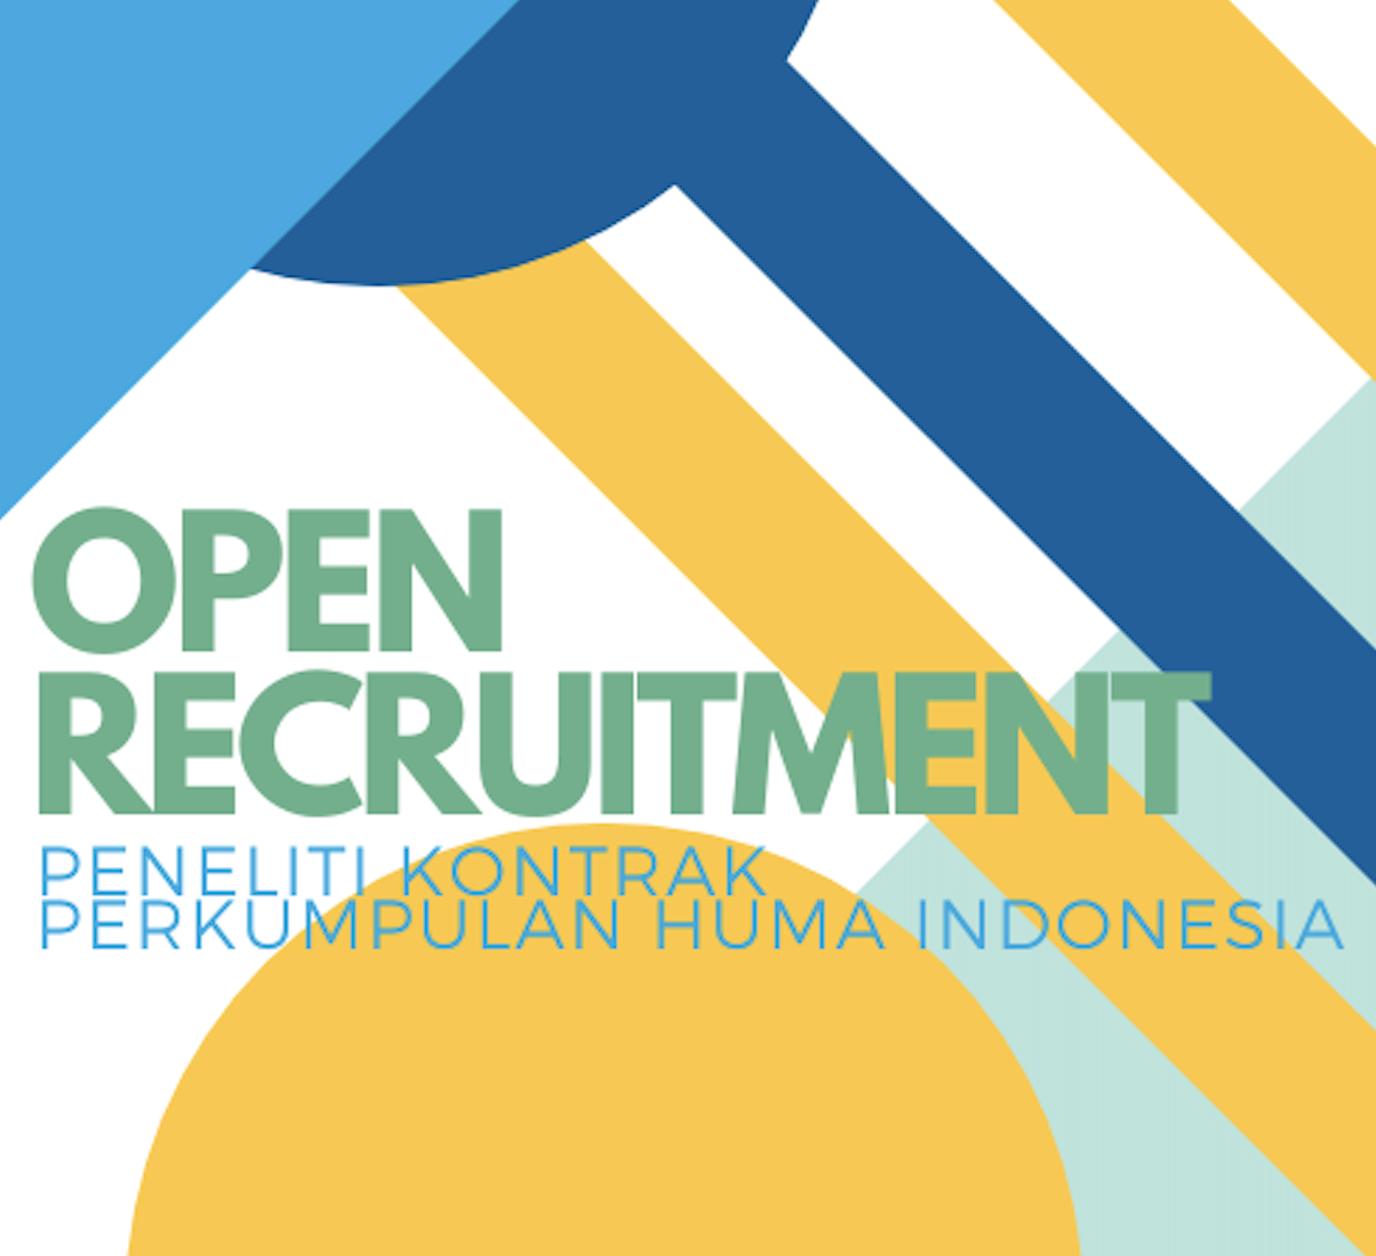 OPEN RECRUITMENT - Peneliti Kontrak Perkumpulan HuMa Indonesia